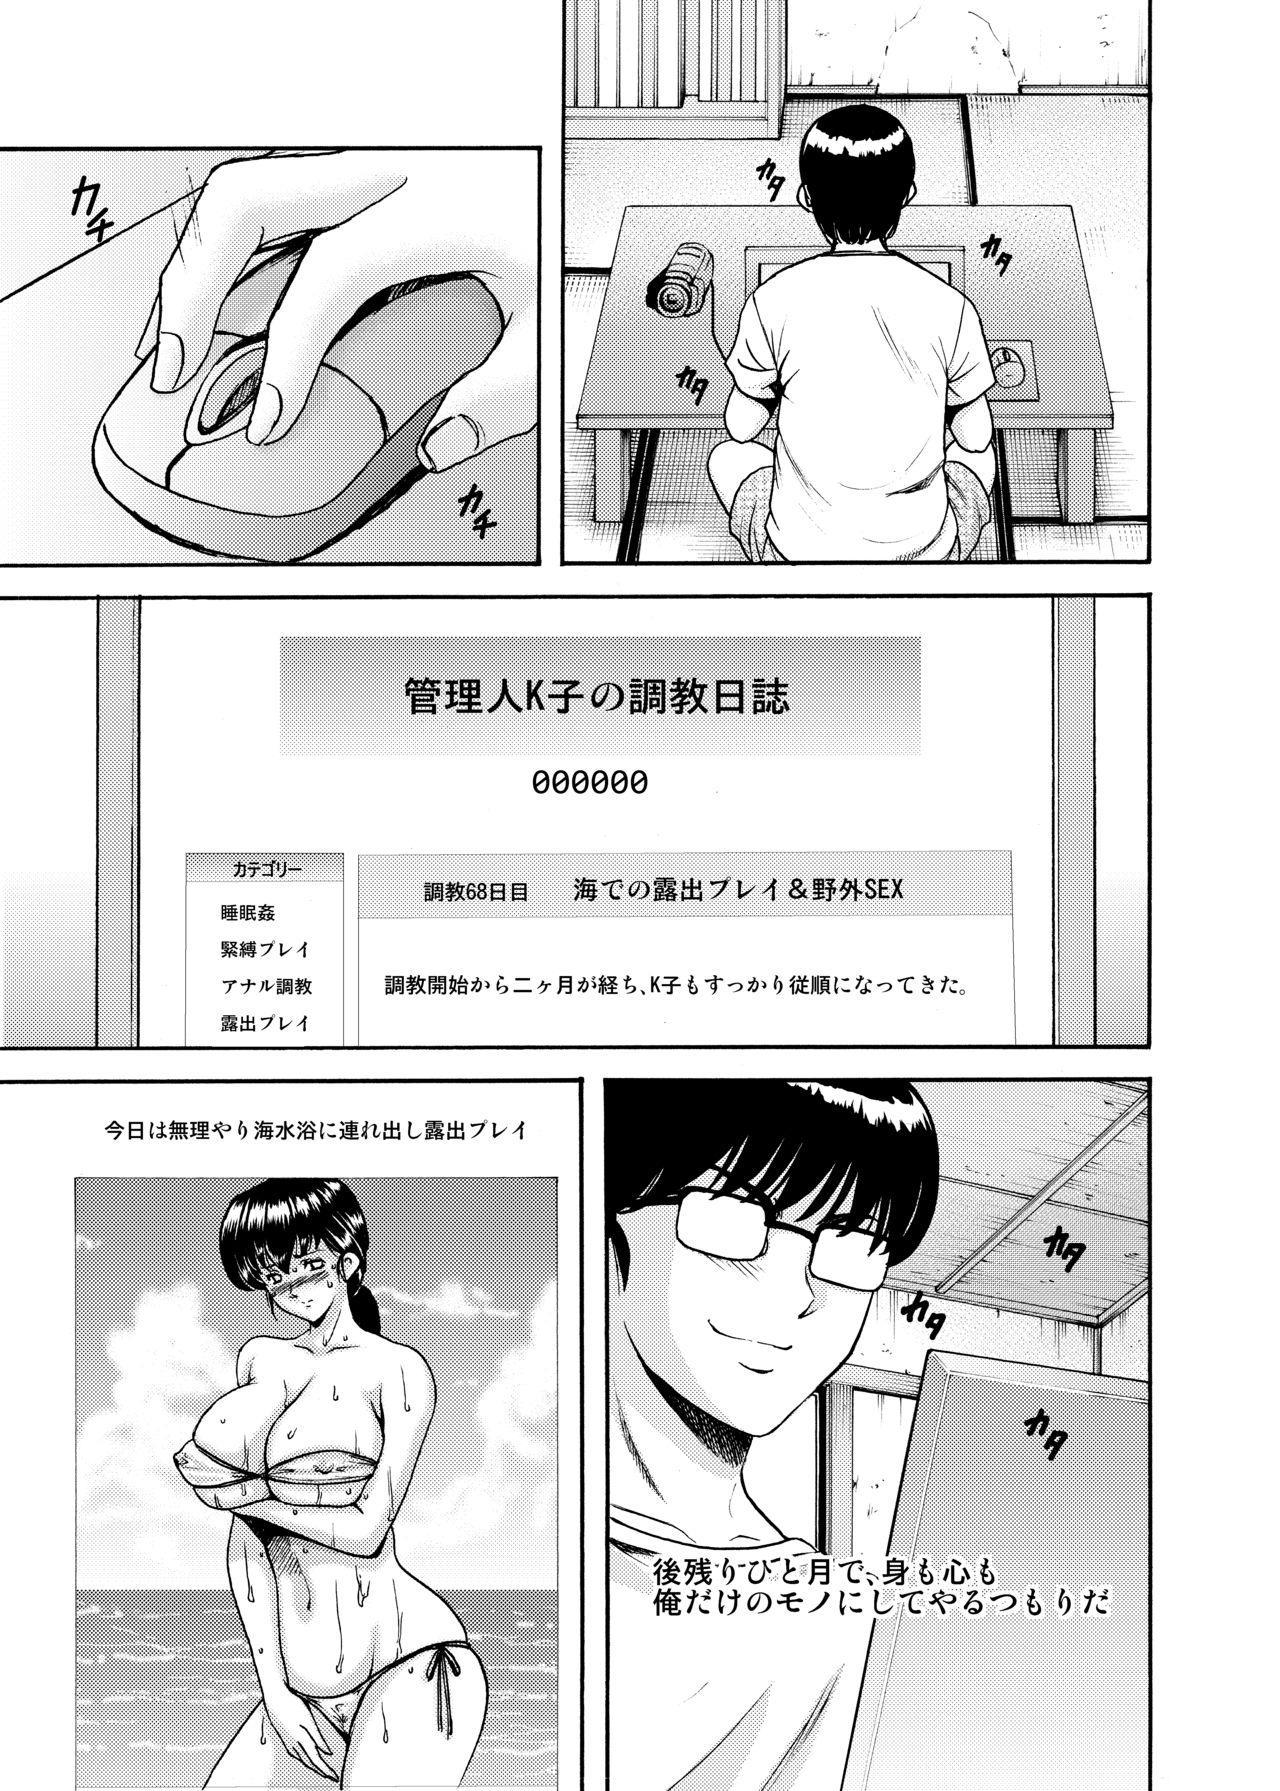 Hitozuma Kanrinin Kyouko Bangaihen 2